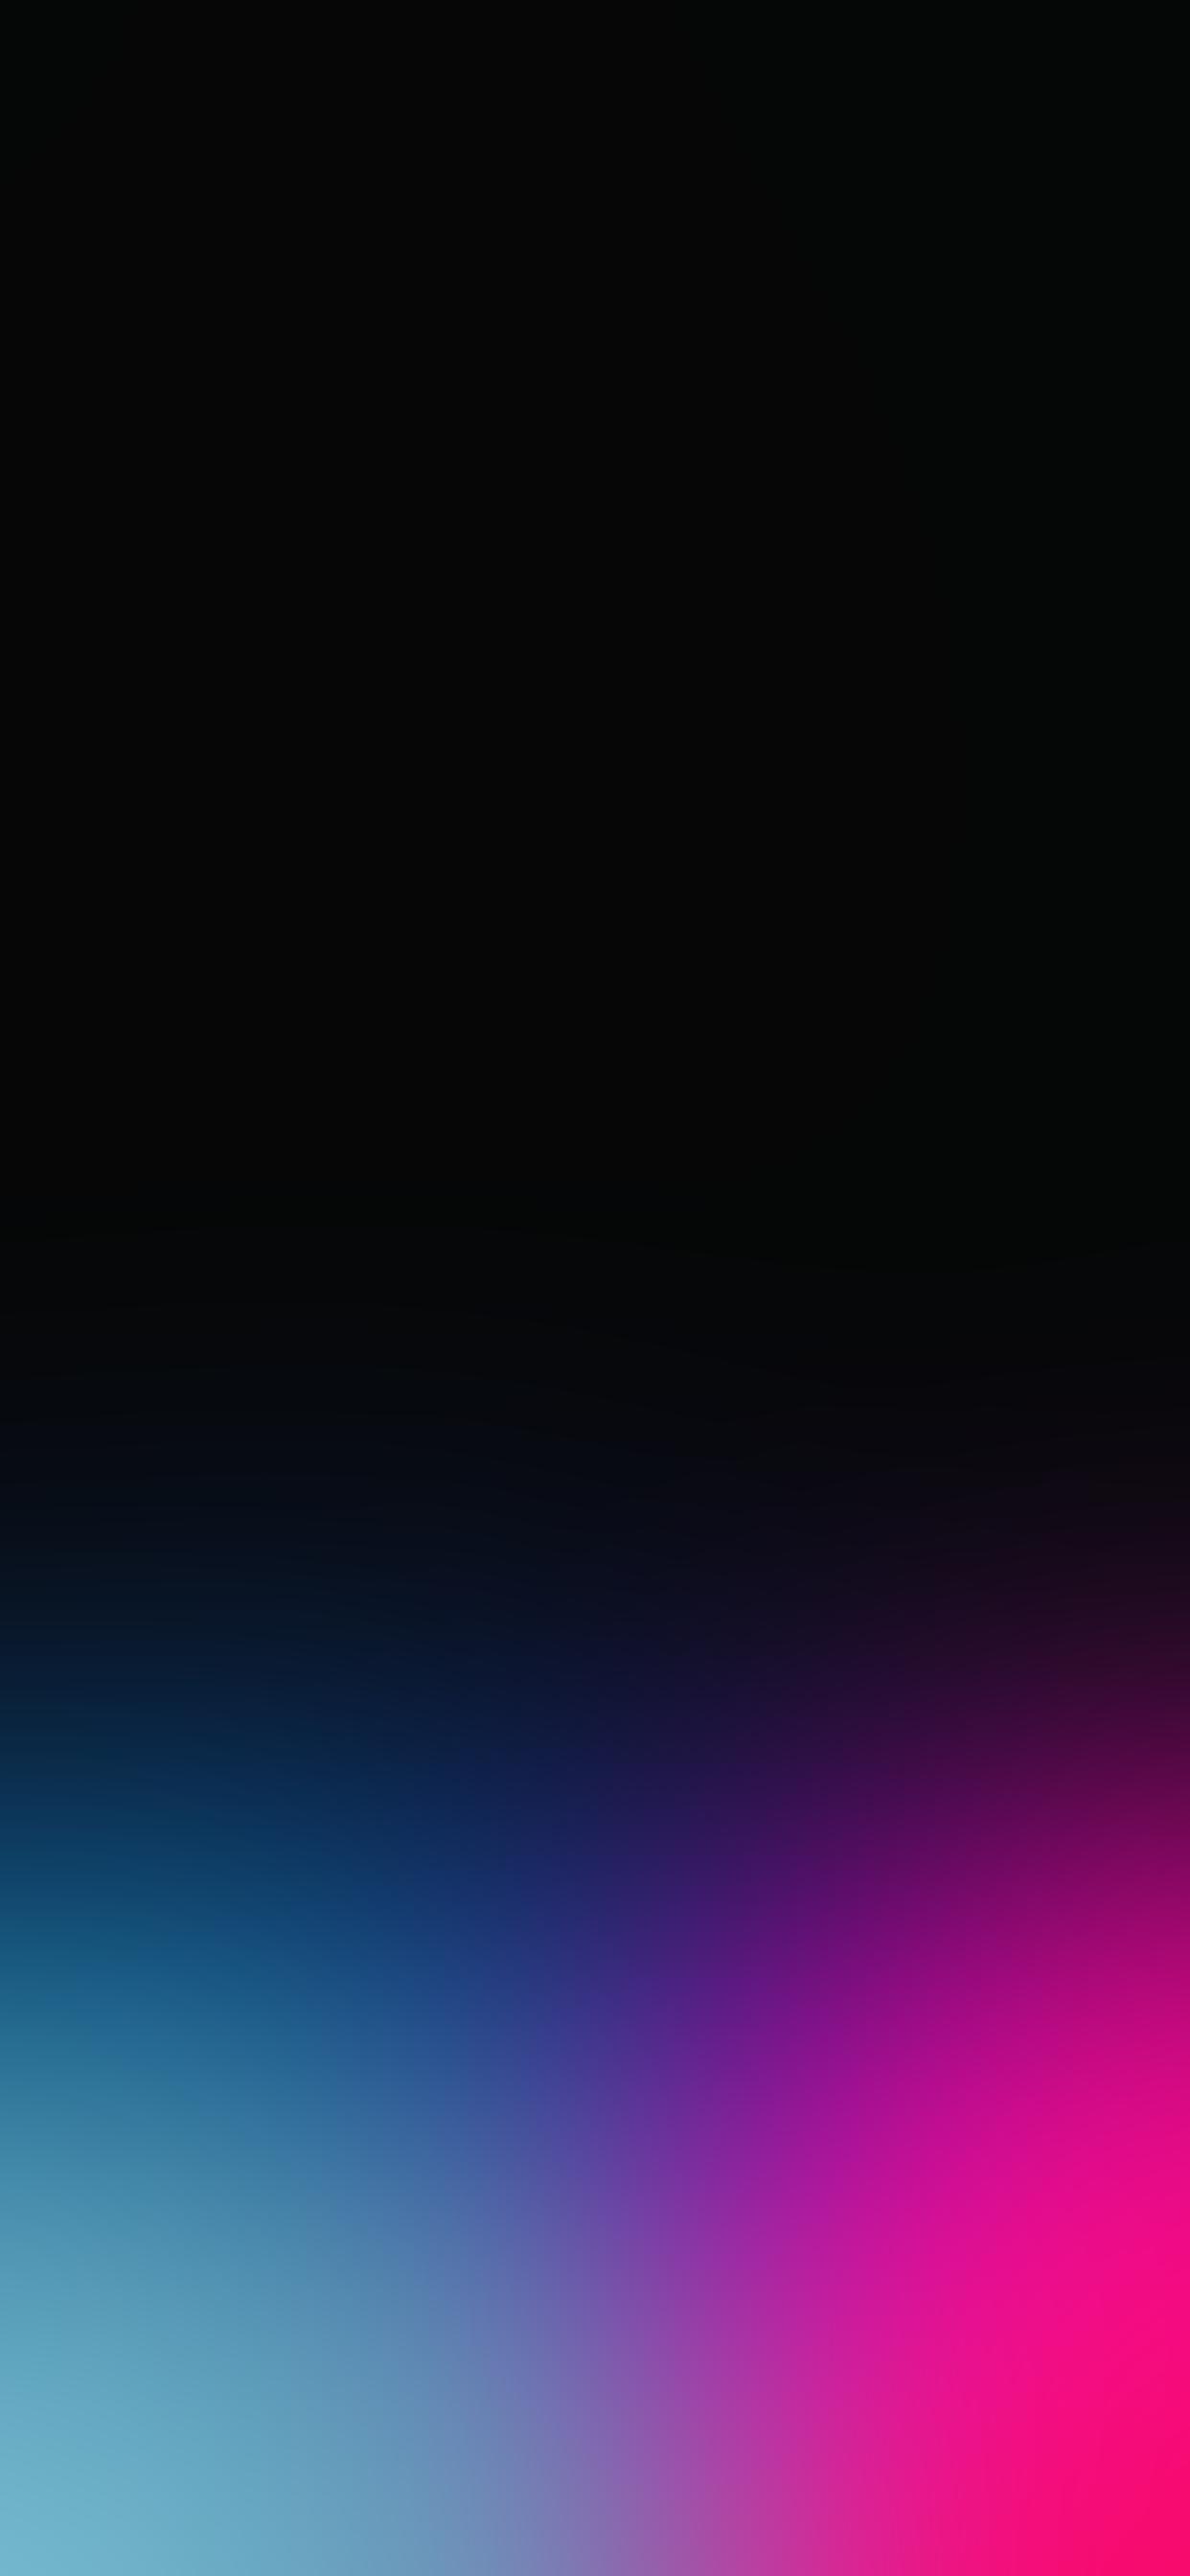 Pink Blue True Black Gradient Wallpaper Iphone Ar72014 True Black Wallpaper Minimal Iphone 11 1242x2688 Download Hd Wallpaper Wallpapertip